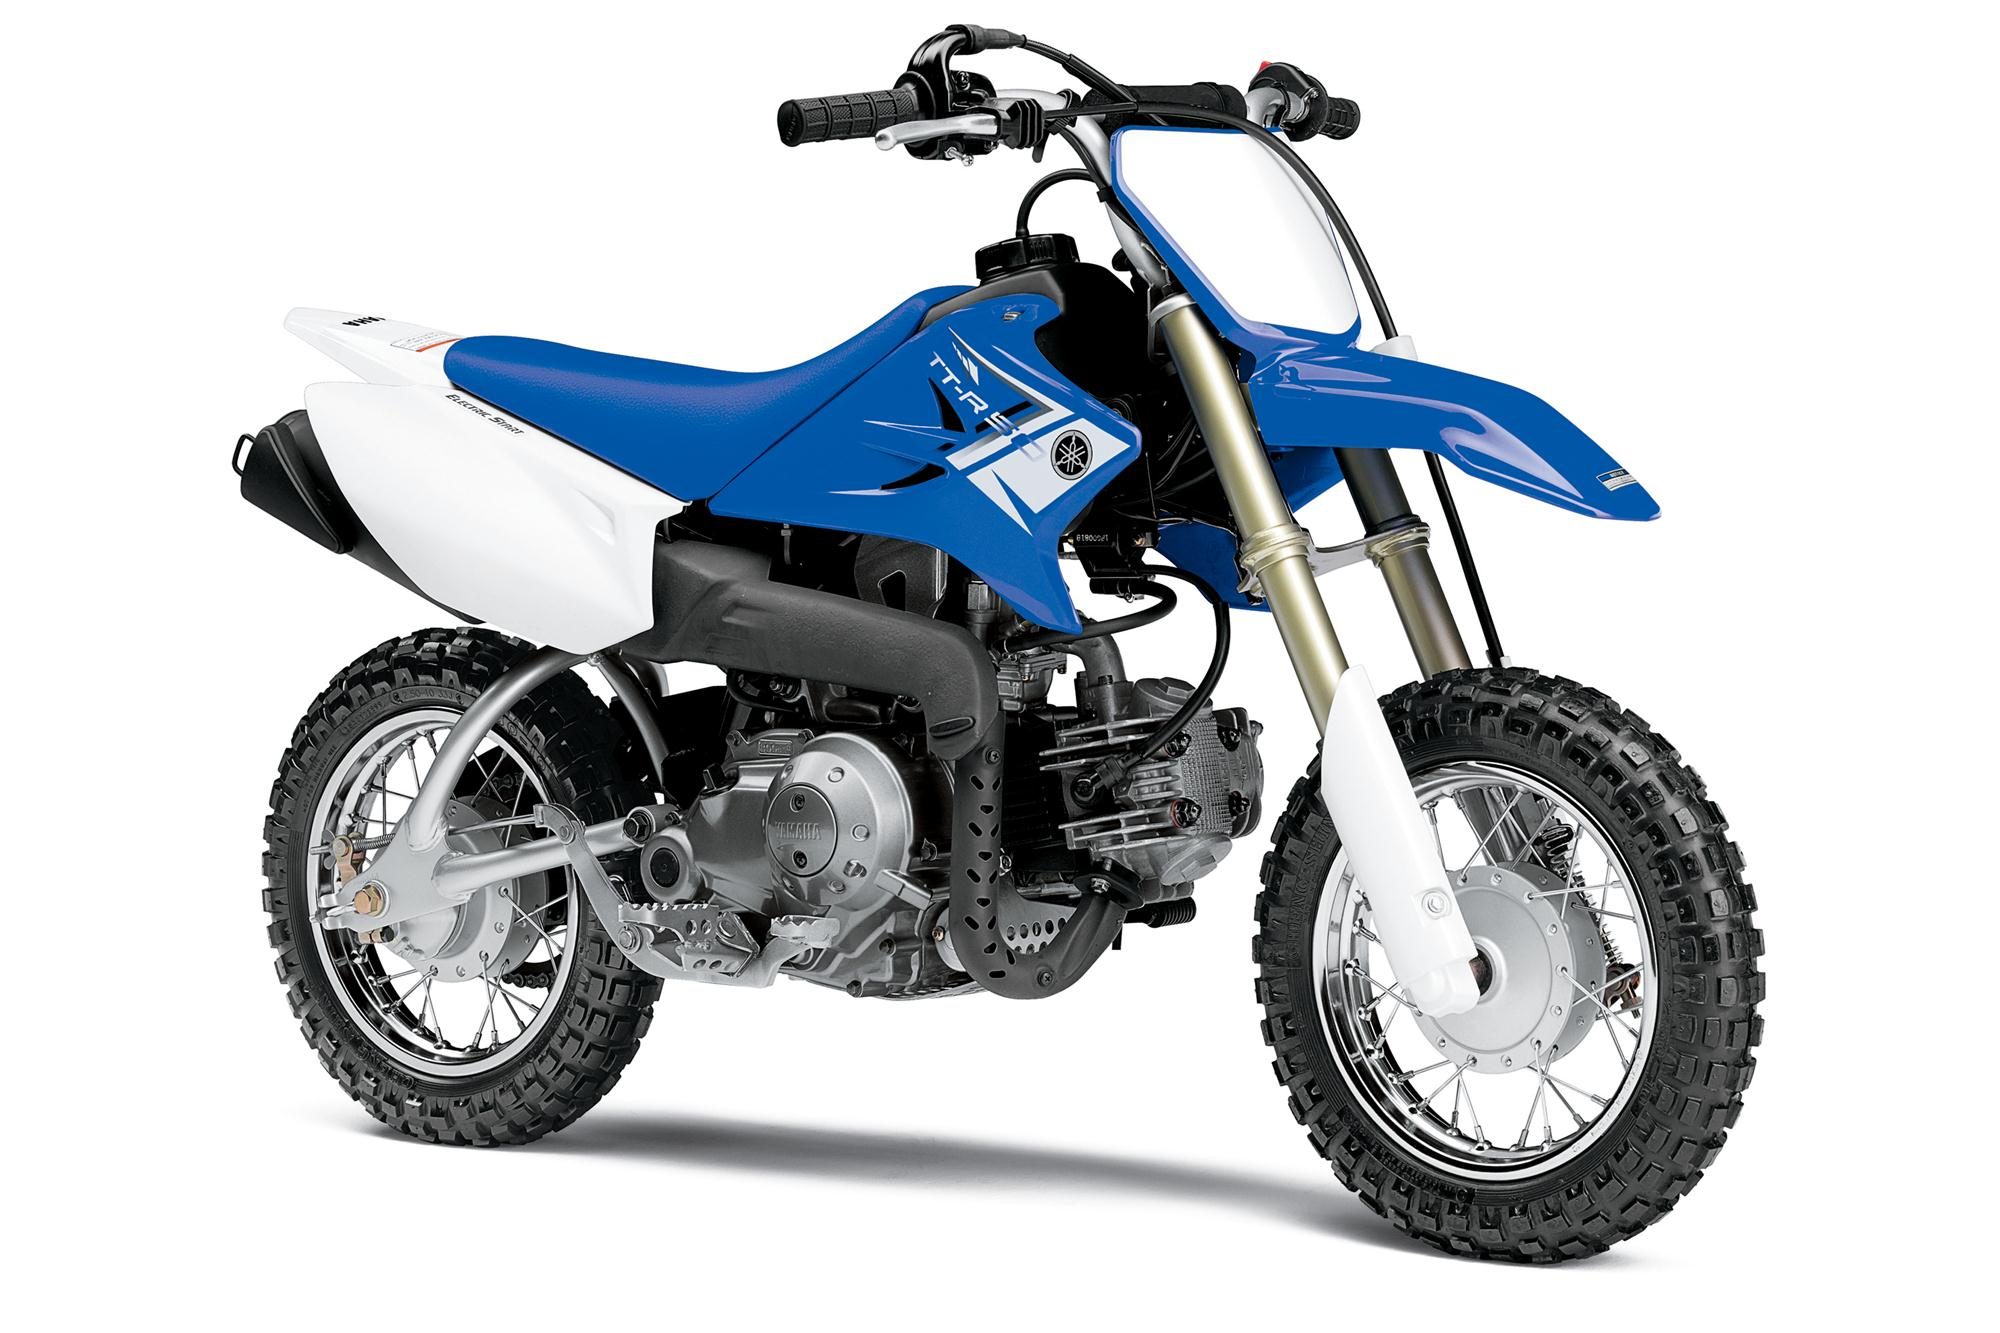 hight resolution of wrg 5047 ttr50 wiring diagram2013 yamaha tt r50e 3 speed automatic dirt bike